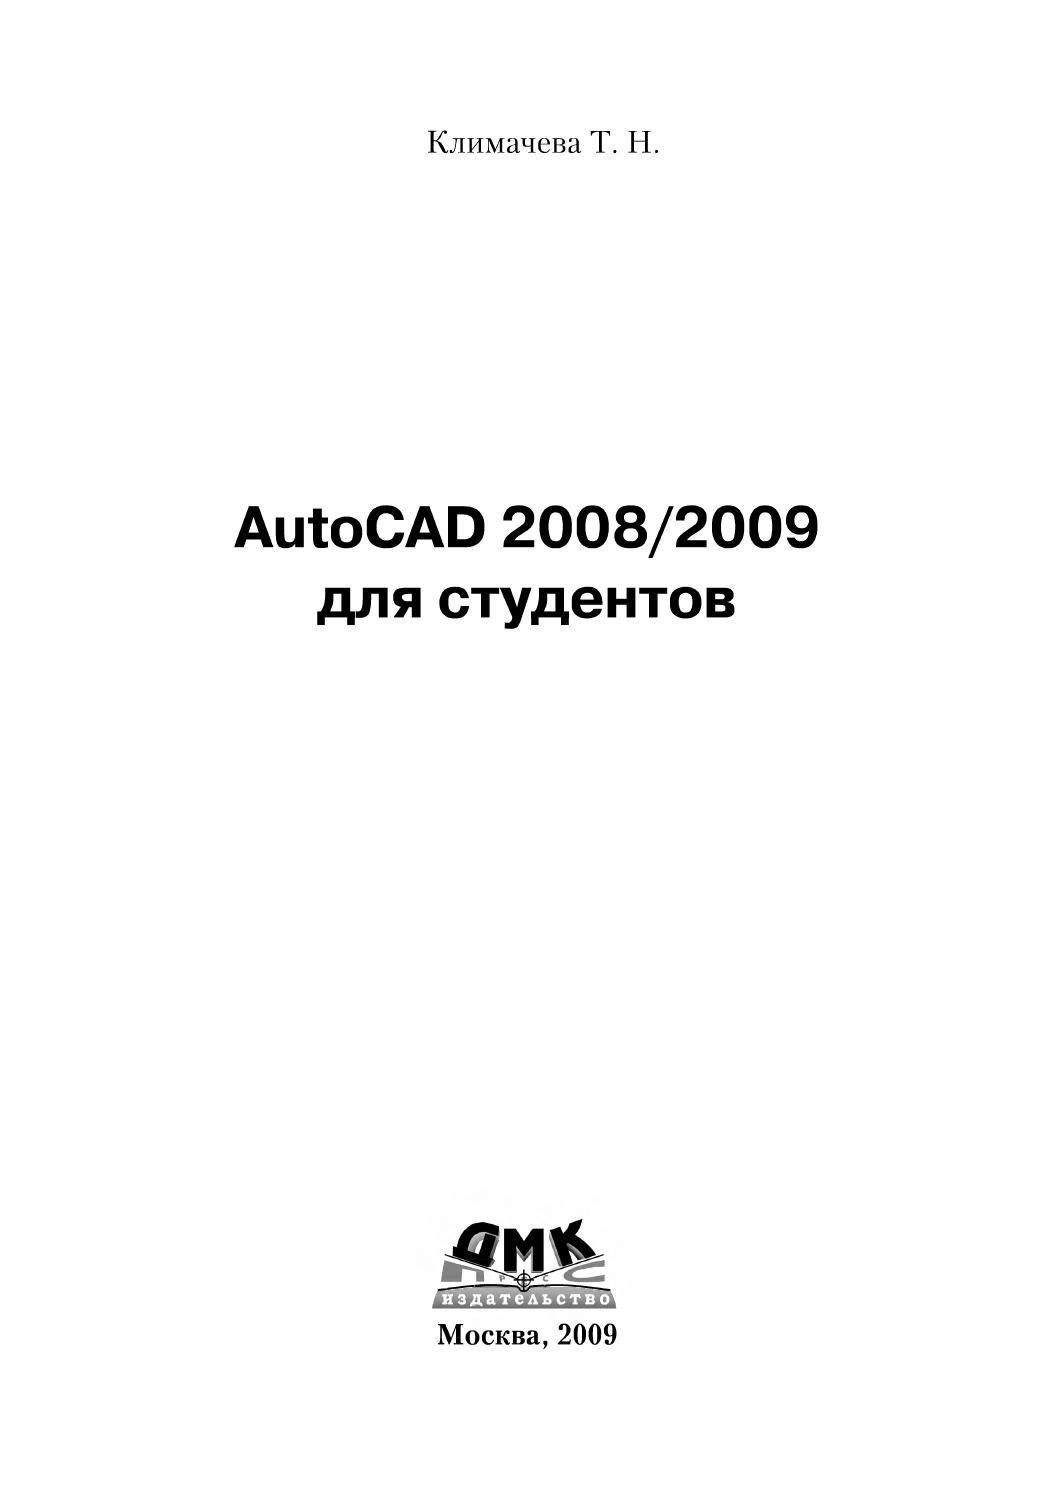 Cale Bebe Lit Le Luxe КРимачева т н Autocad 2008 2009 дРя студентов 2009 by Djon